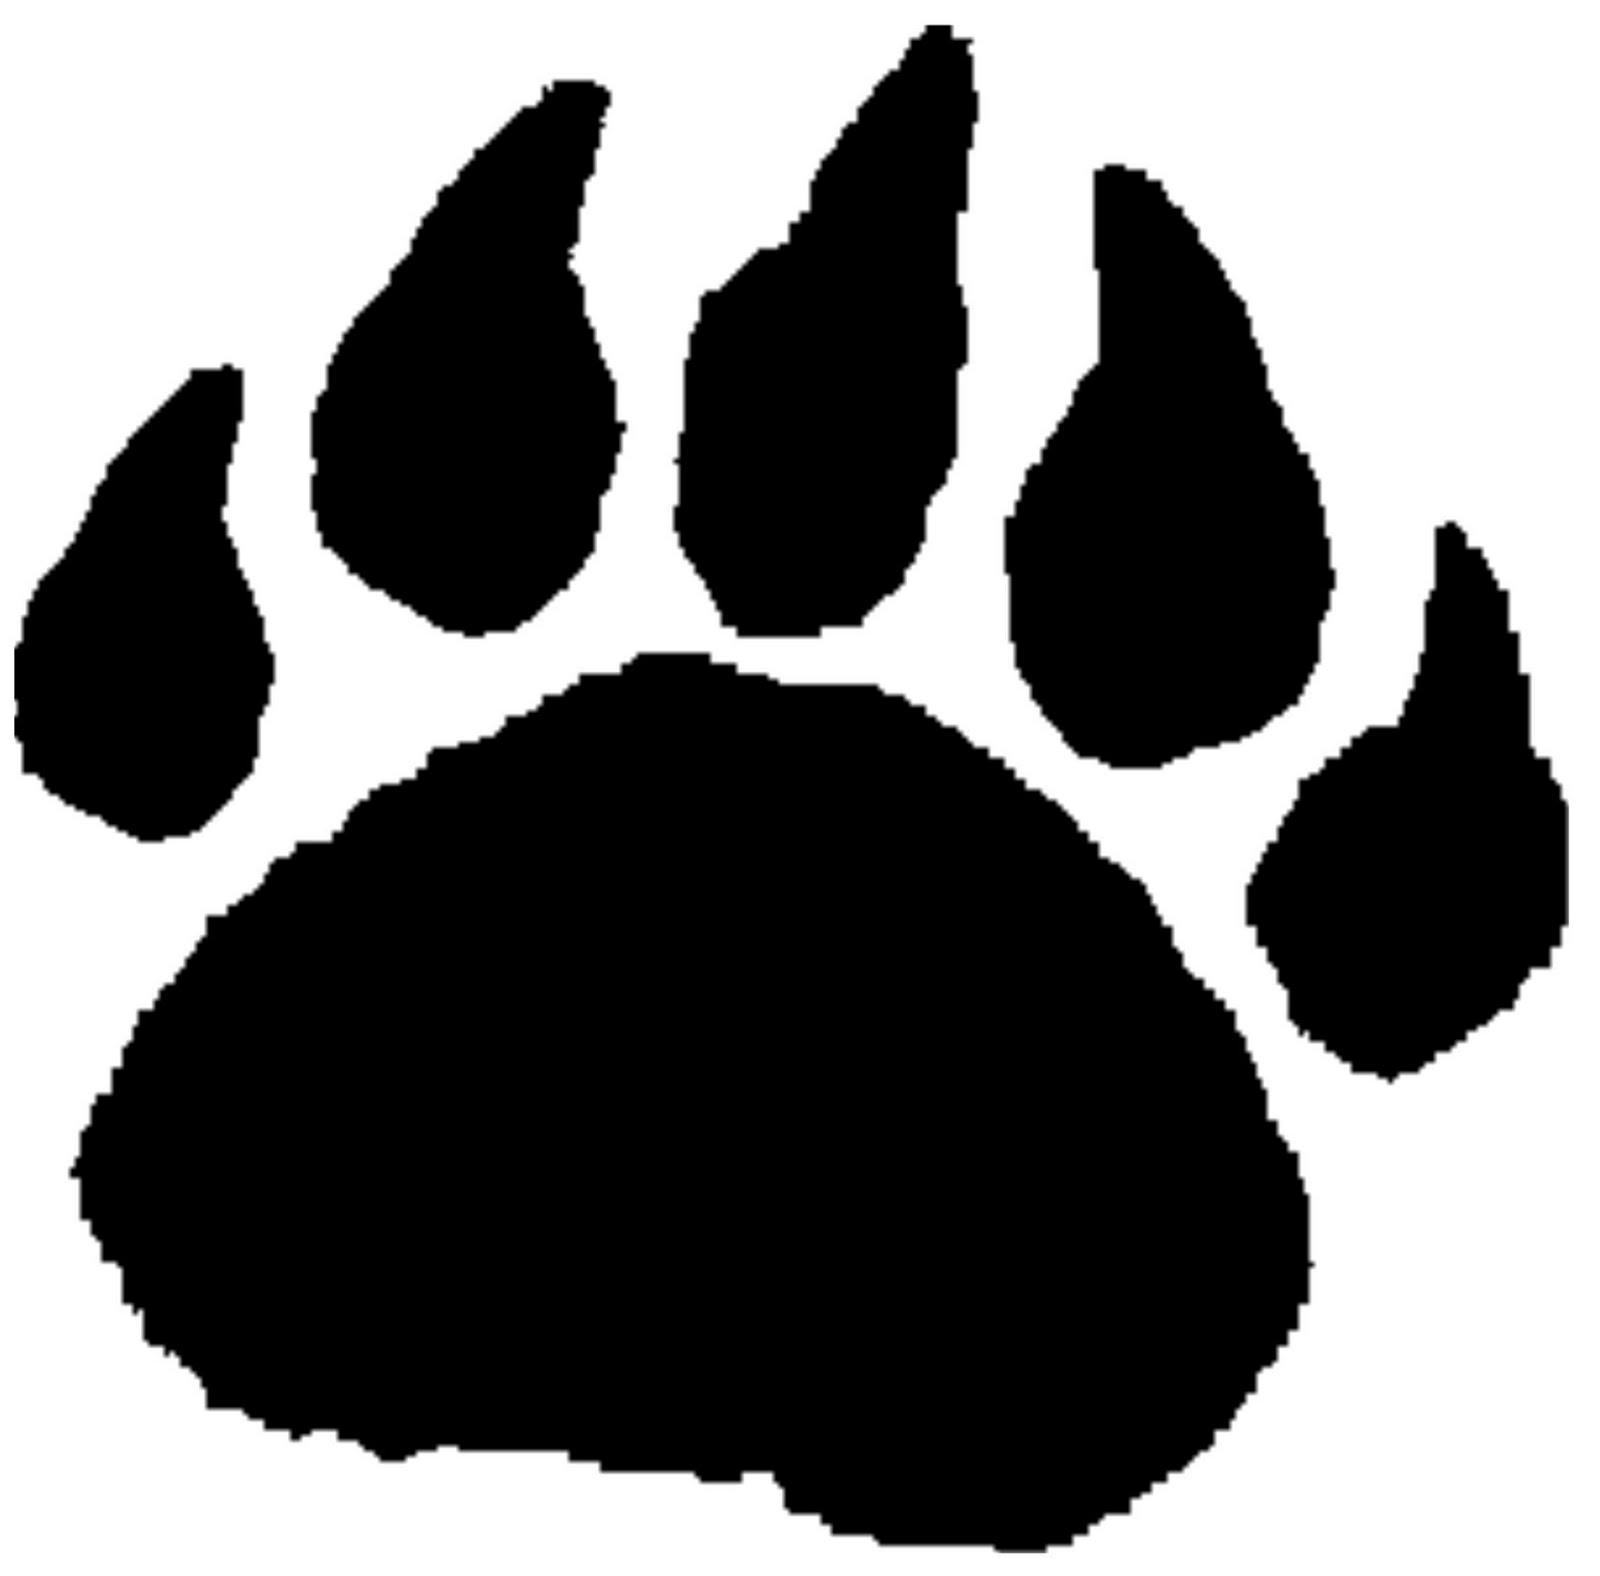 image 550ea234080be9aa359666a640b3279a grizzly bear paw print rh bang a rang org wikia com black bear paw print clip art bear paw prints clip art free